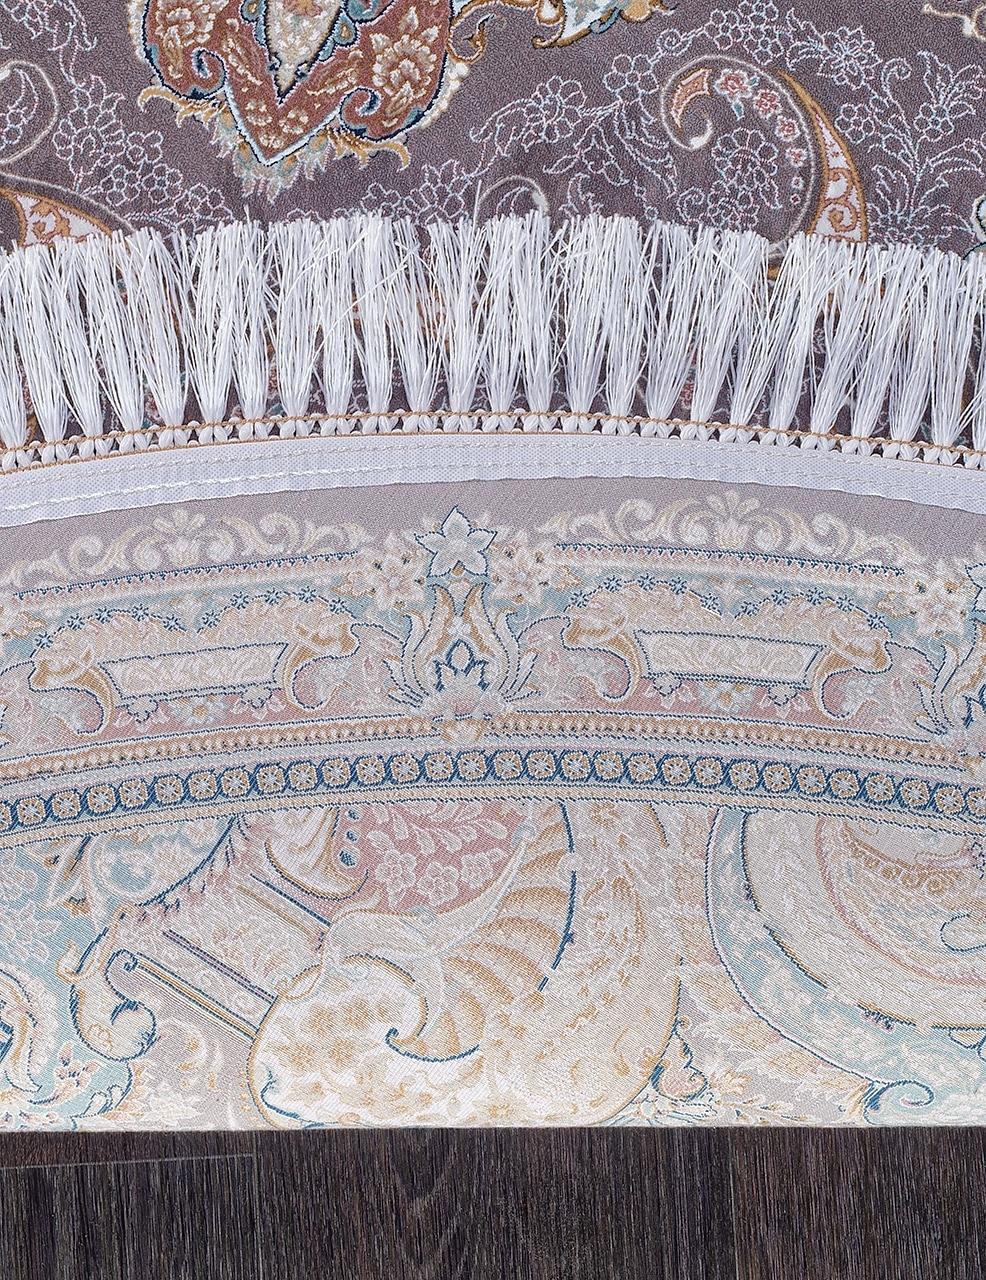 Ковер 144 - MELANGE PINK - Круг - коллекция FARSI 1500 - фото 5